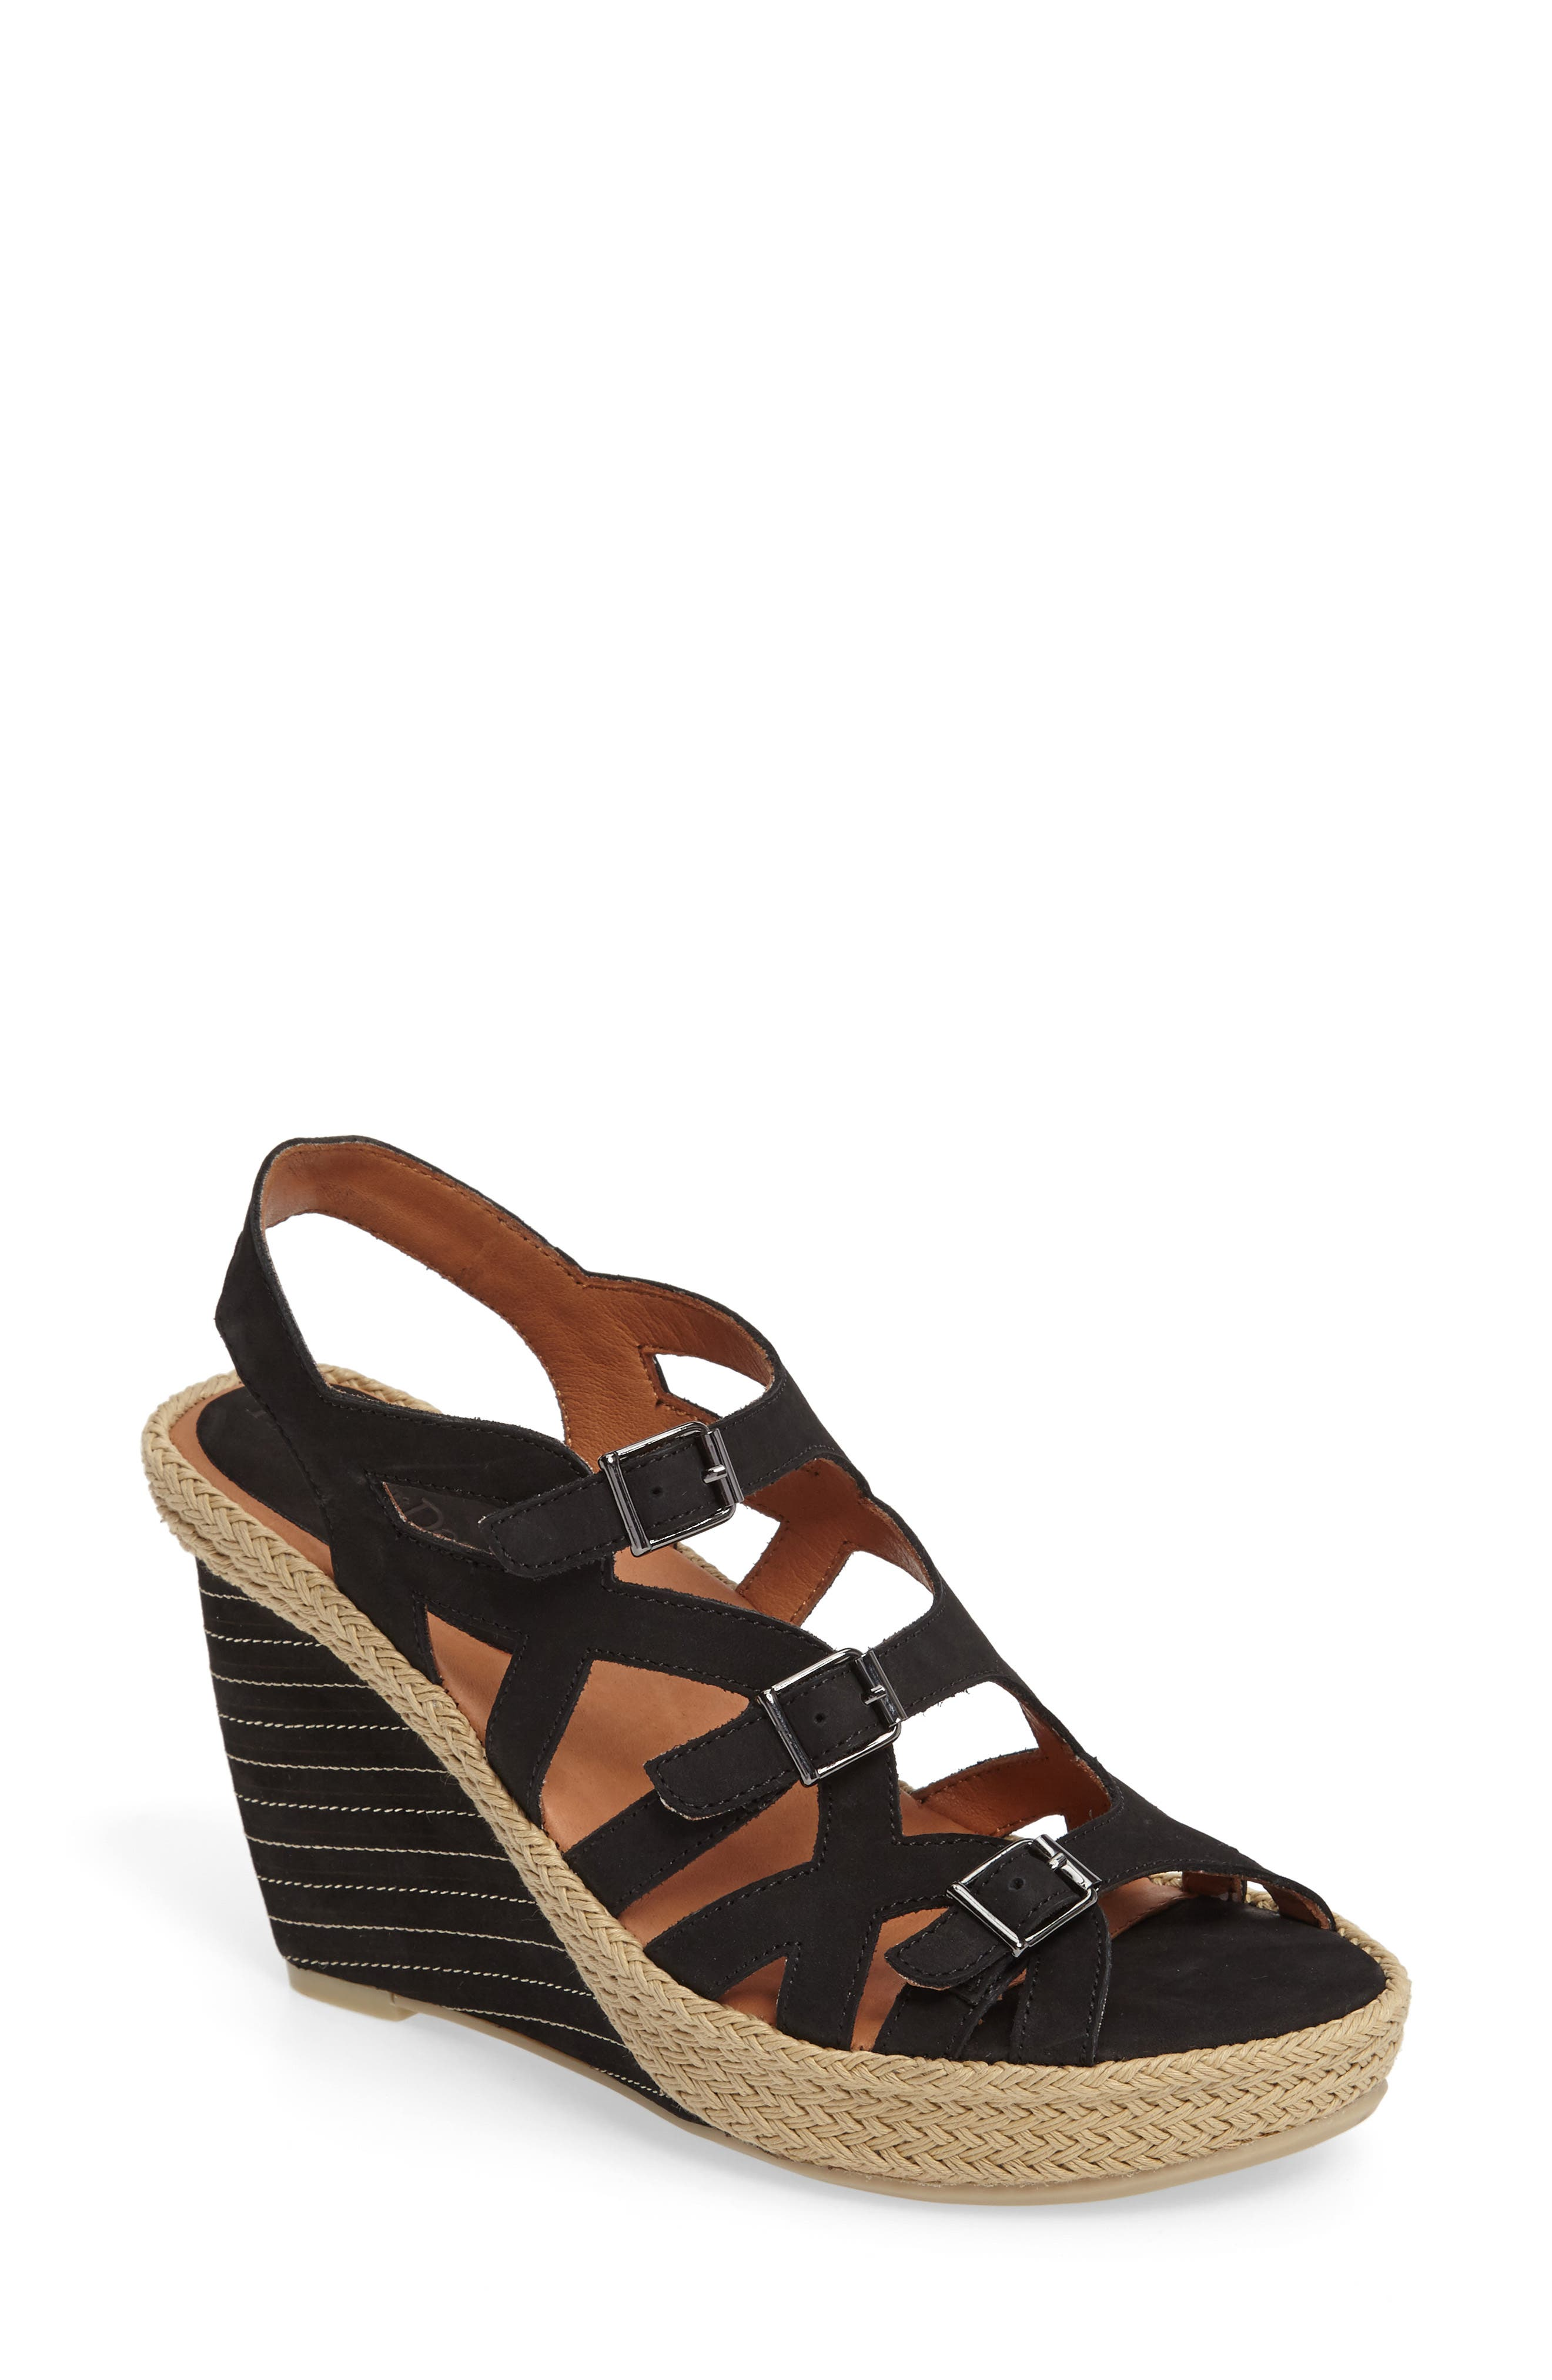 Ignacia Wedge Sandal,                             Main thumbnail 1, color,                             BLACK NUBUCK